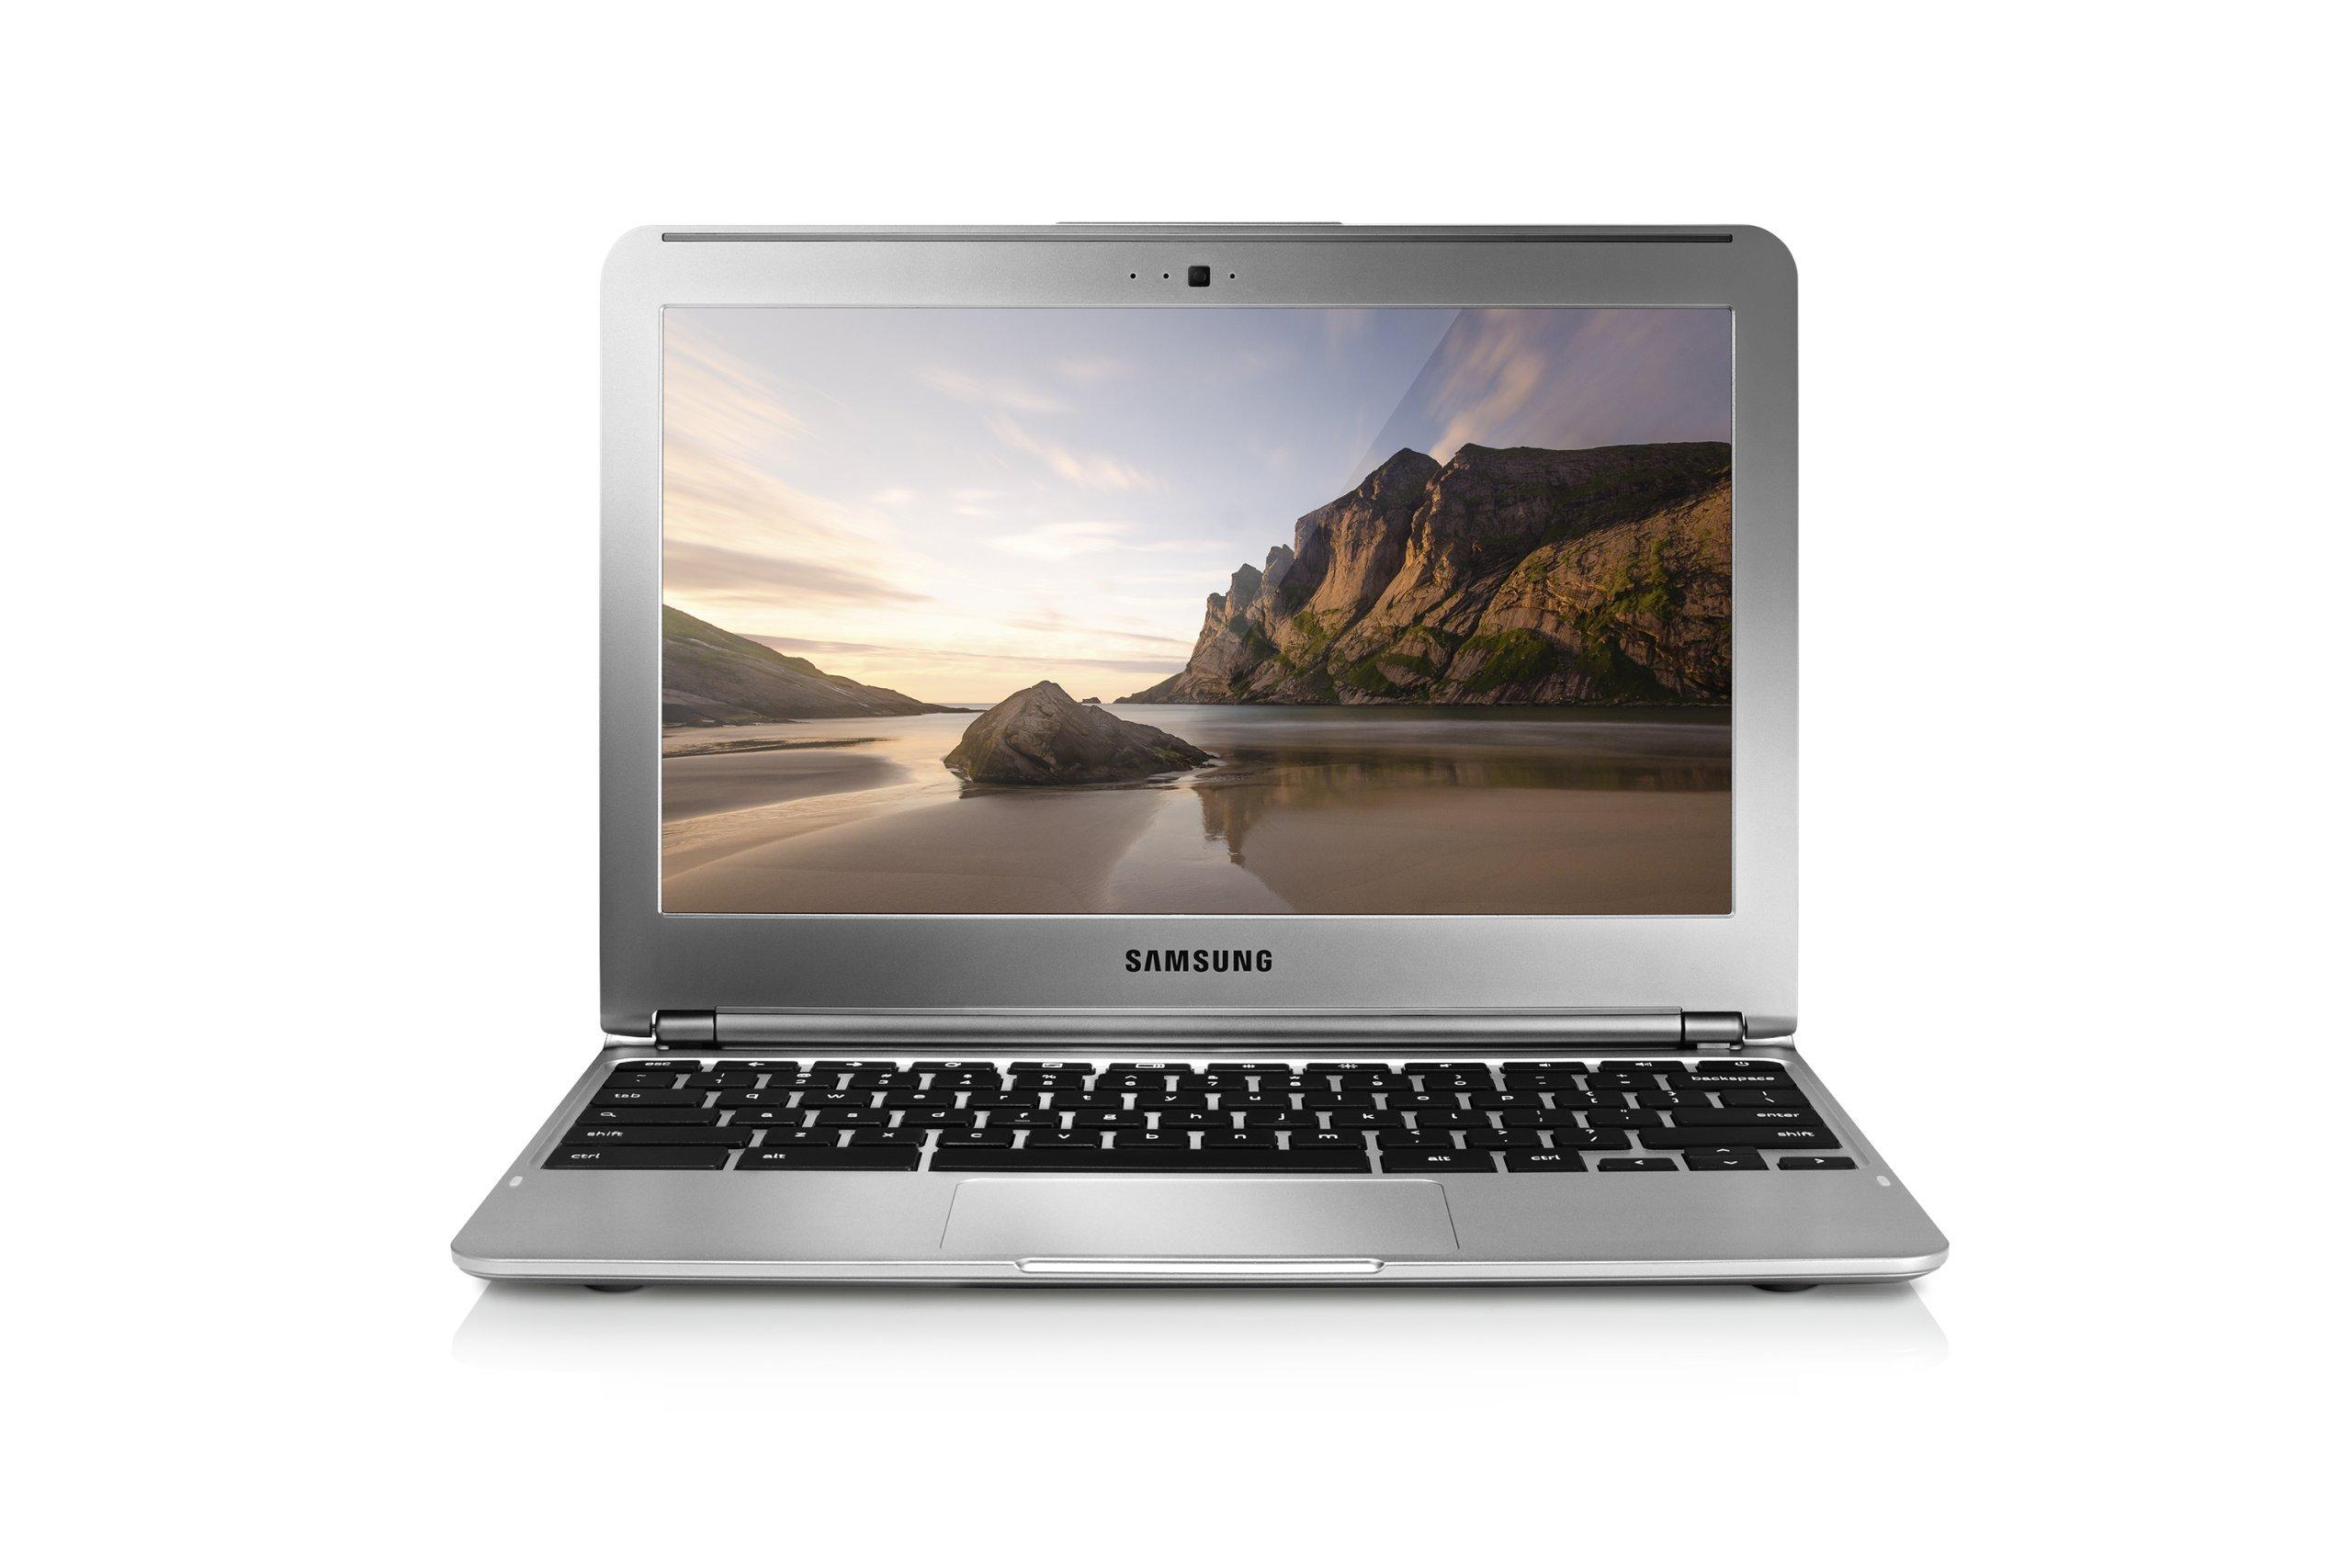 Samsung Chromebook Wi Fi 11 6 Inch Refurbished